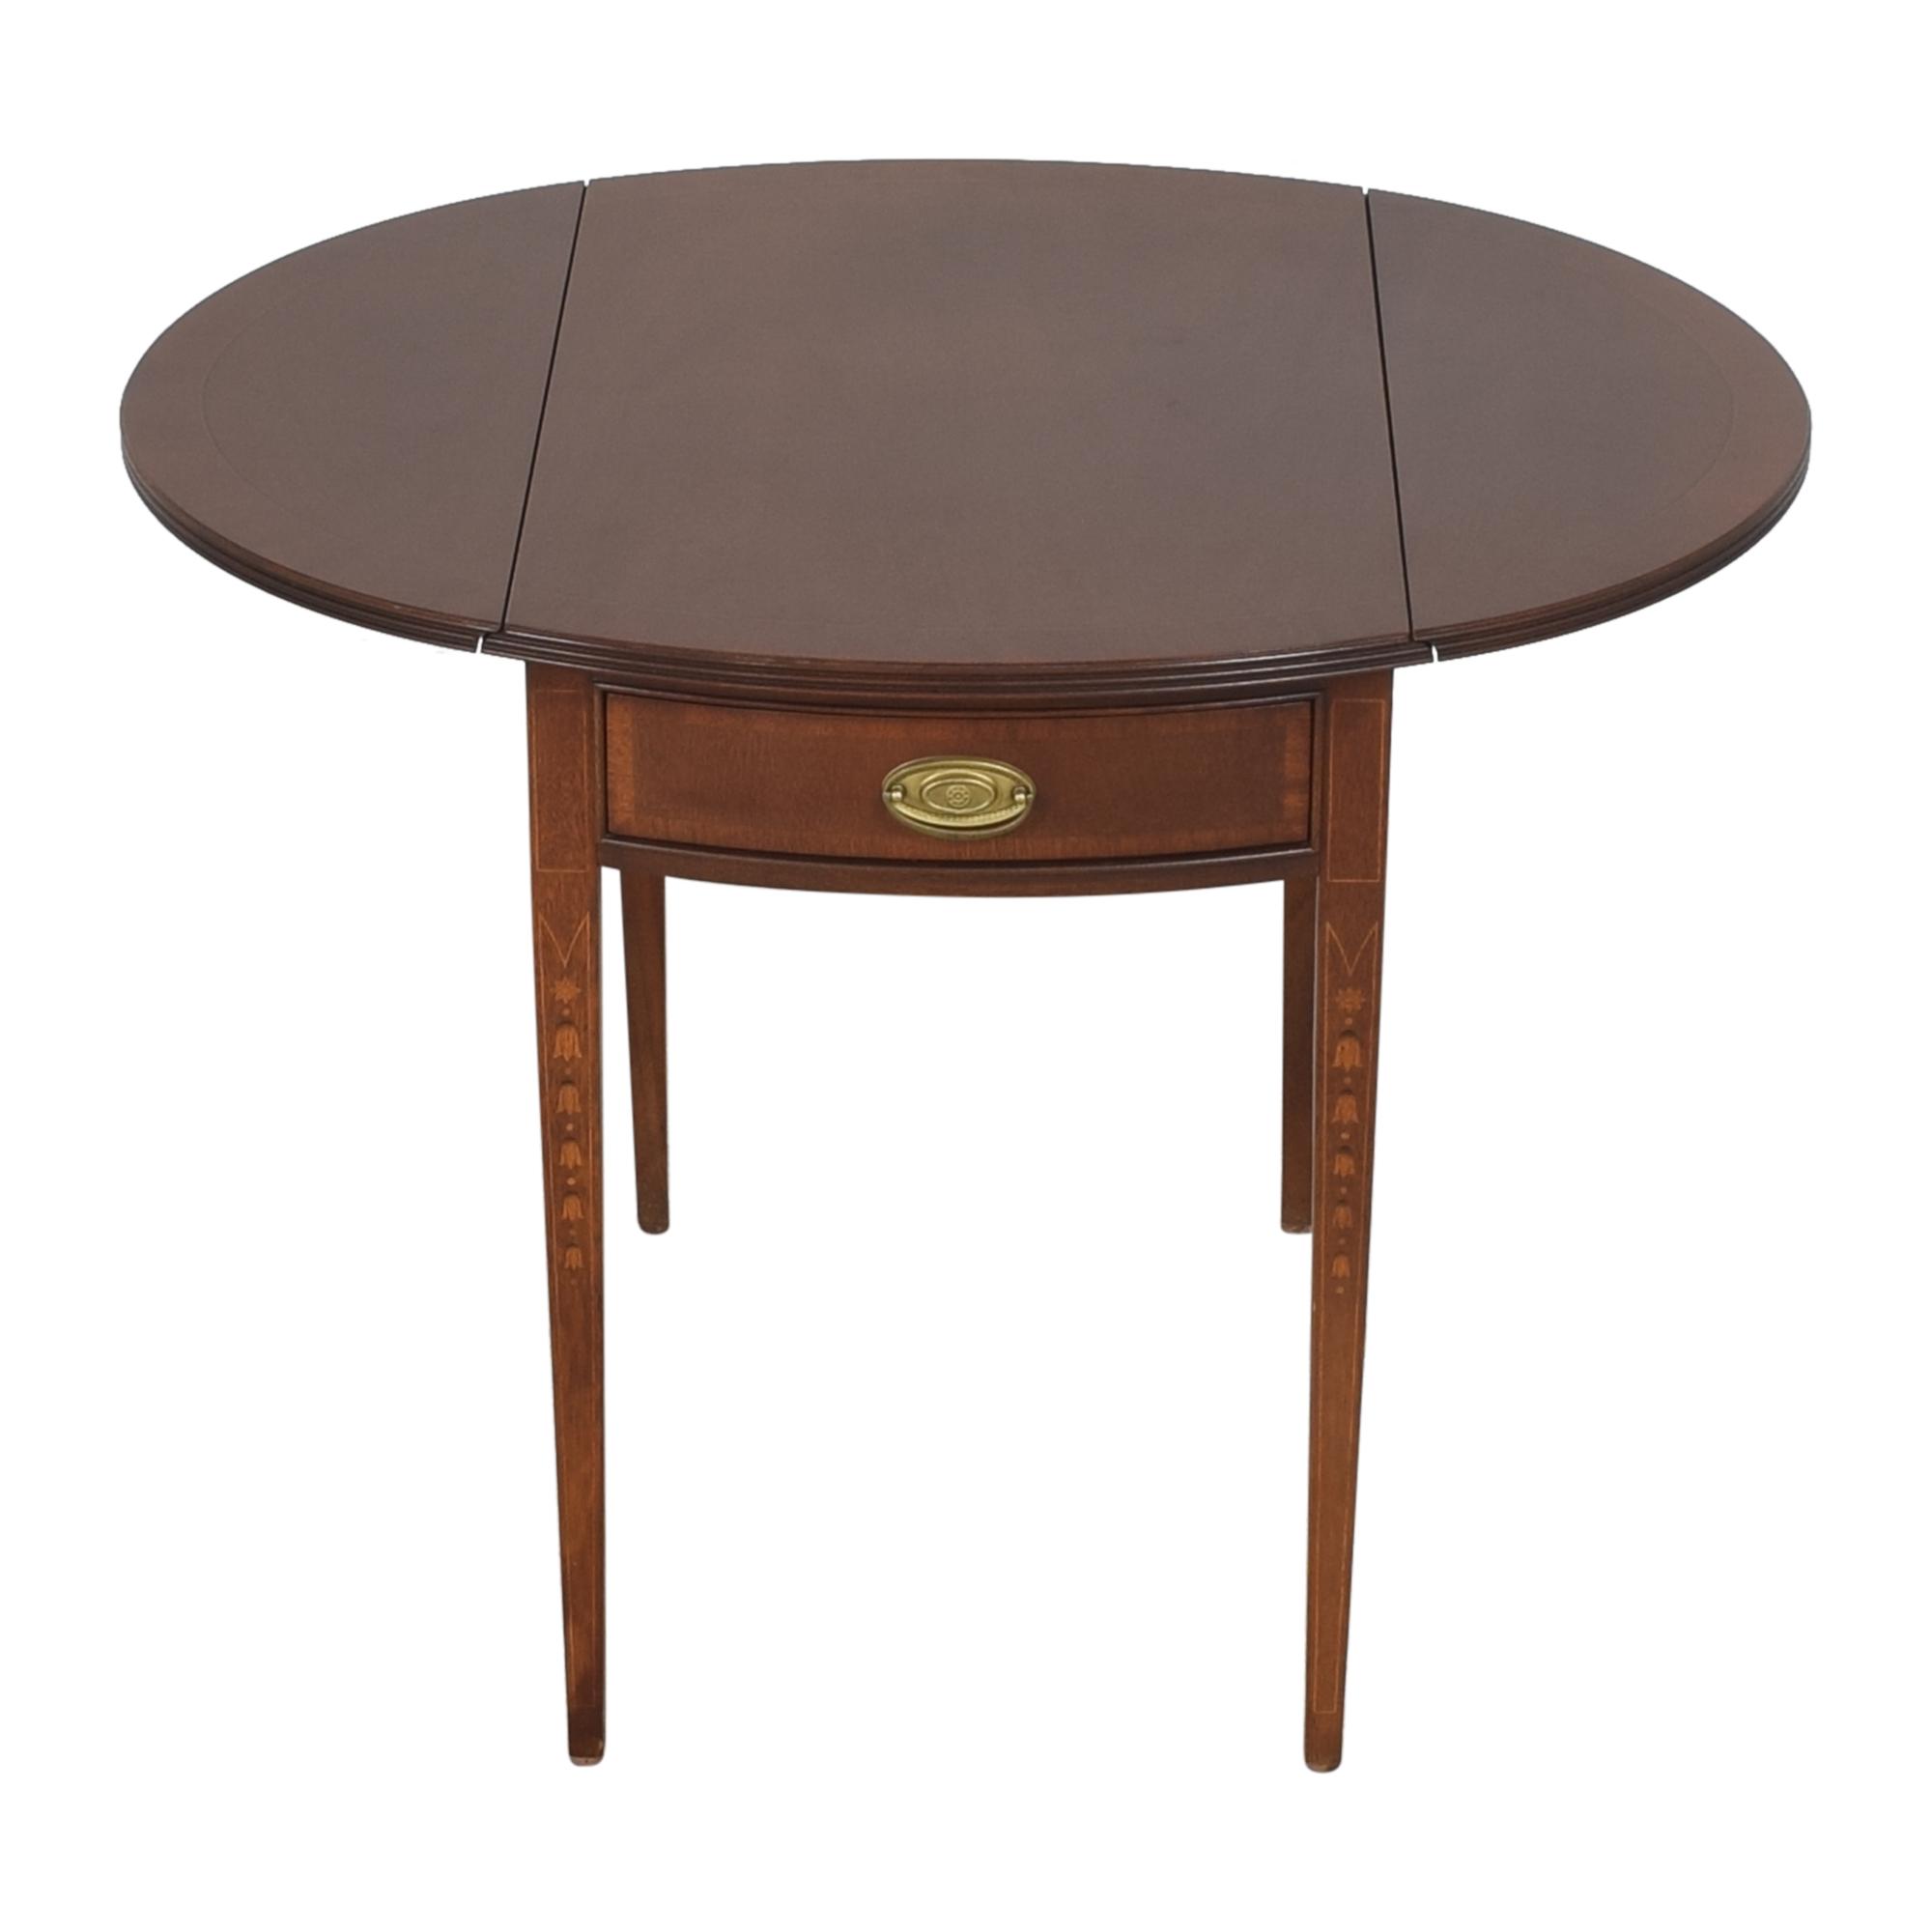 Ethan Allen Ethan Allen 18th Century Collection Pembroke End Table ma